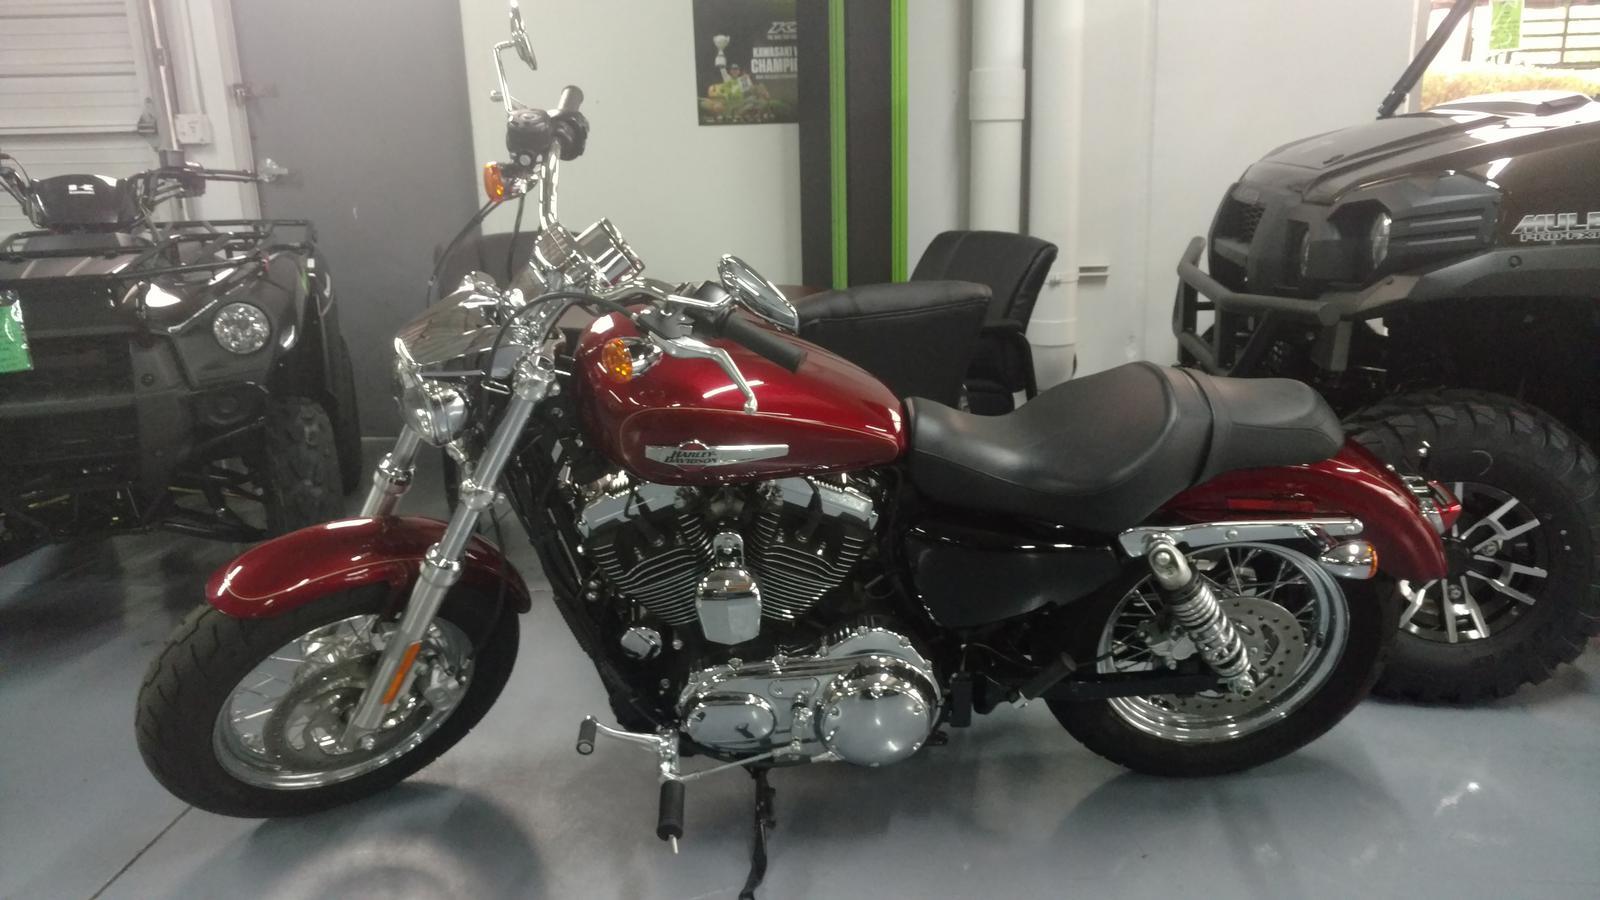 2017 Harley-Davidson® Sportster 1200 Custom